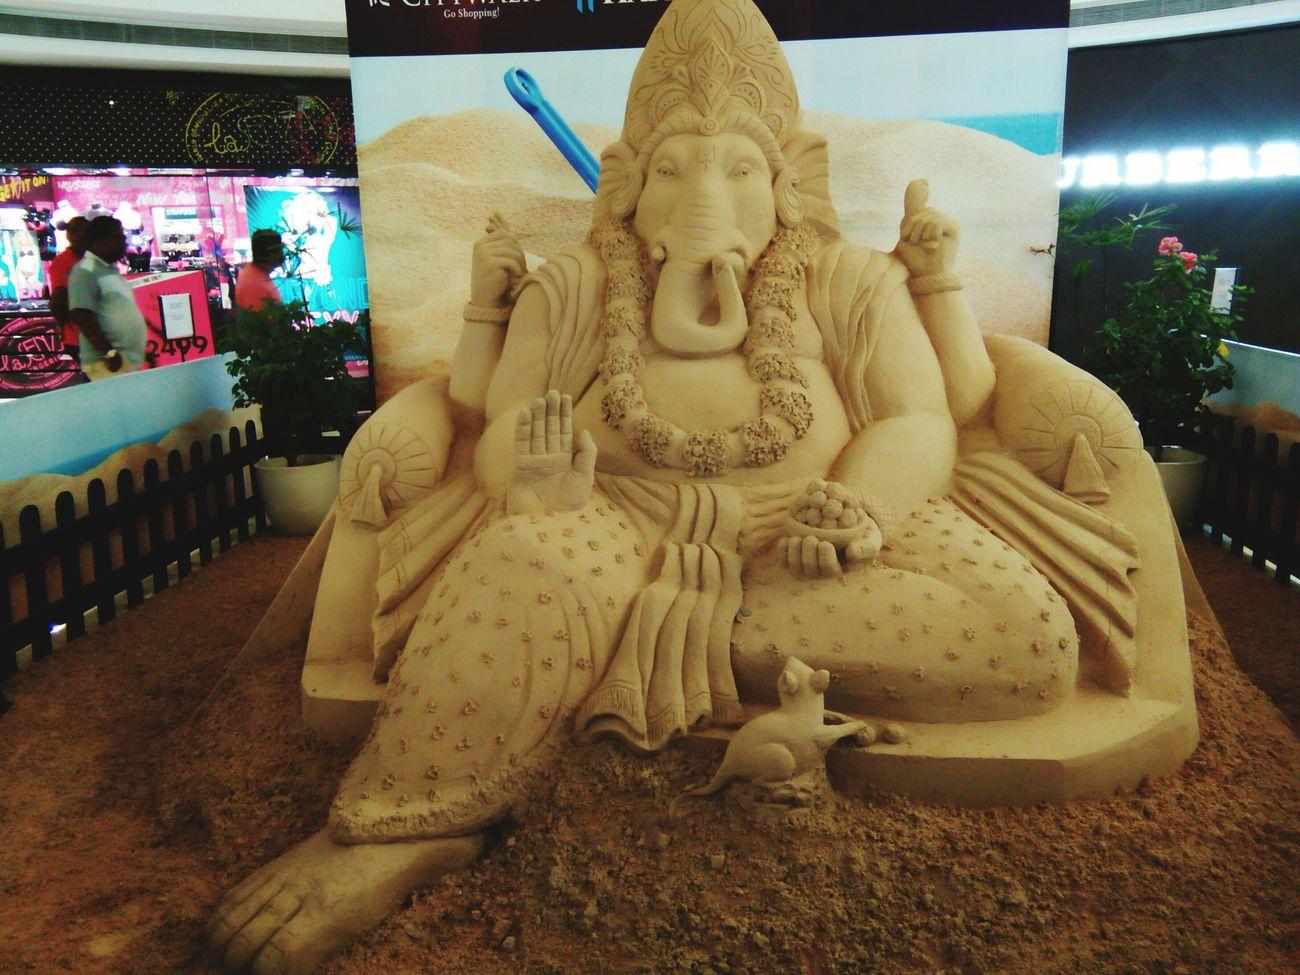 Art And Craft Art Creativity Outdoors Built Structure Sandsculpture LordGanesha Sandart Amazingarts